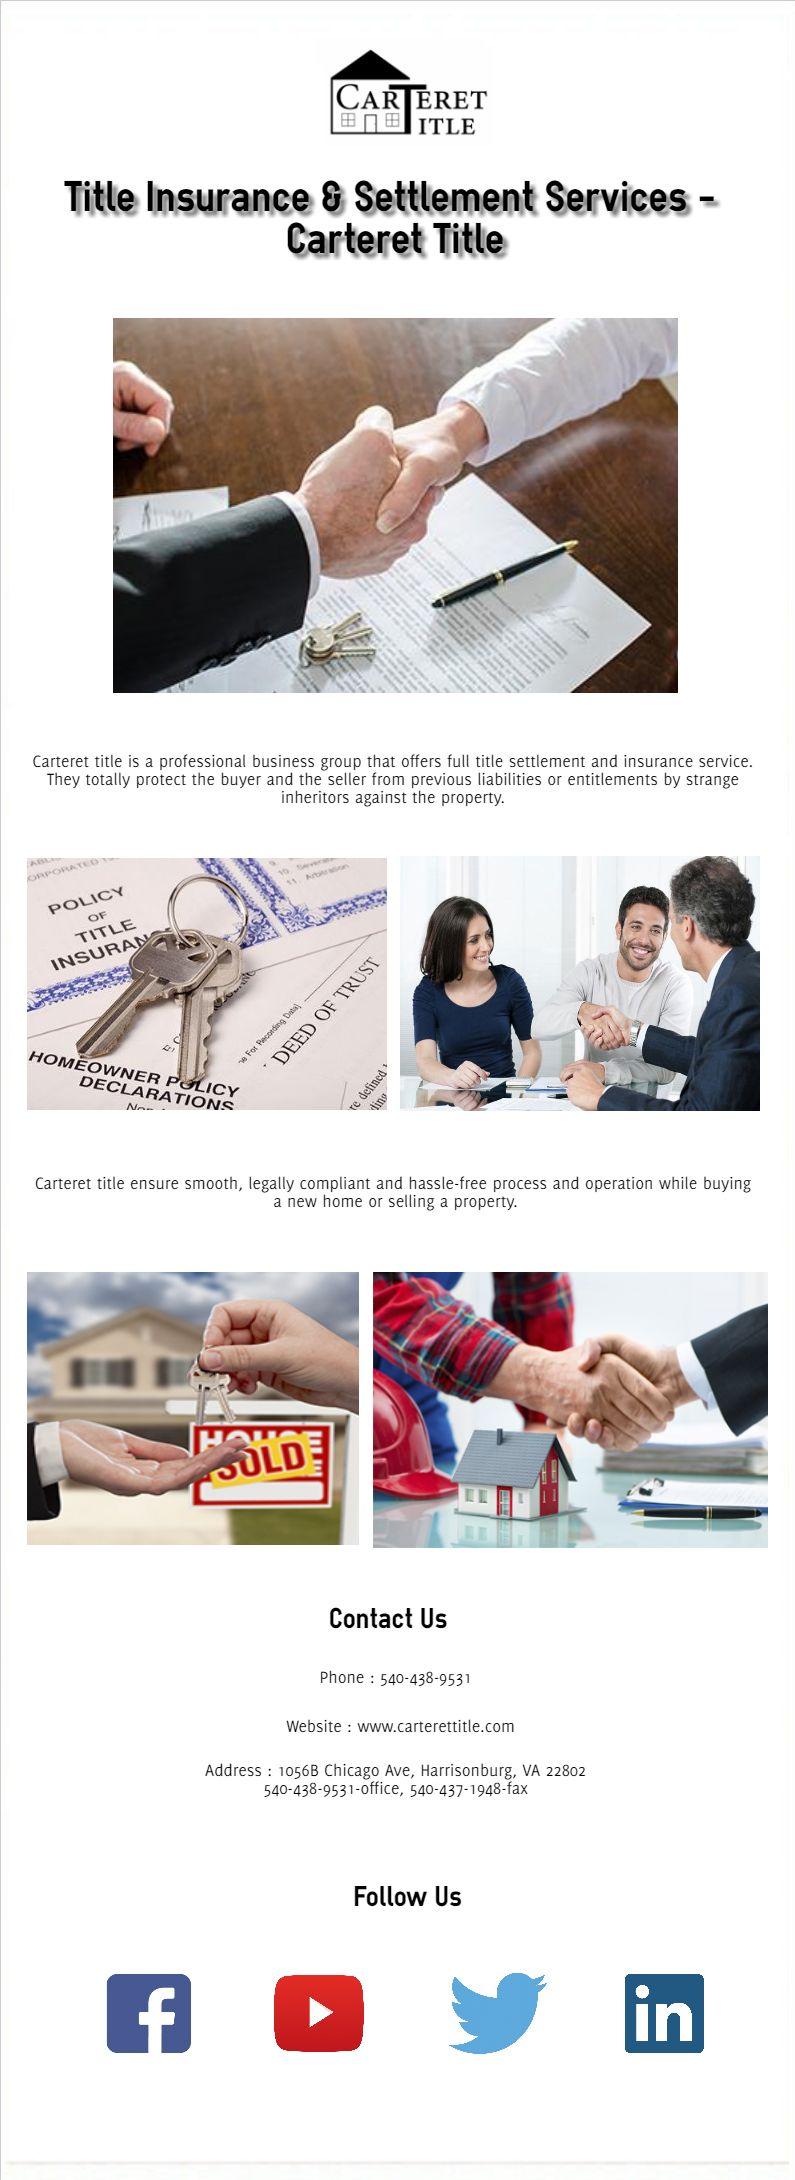 Title Insurance and Settlement Services Carteret Title